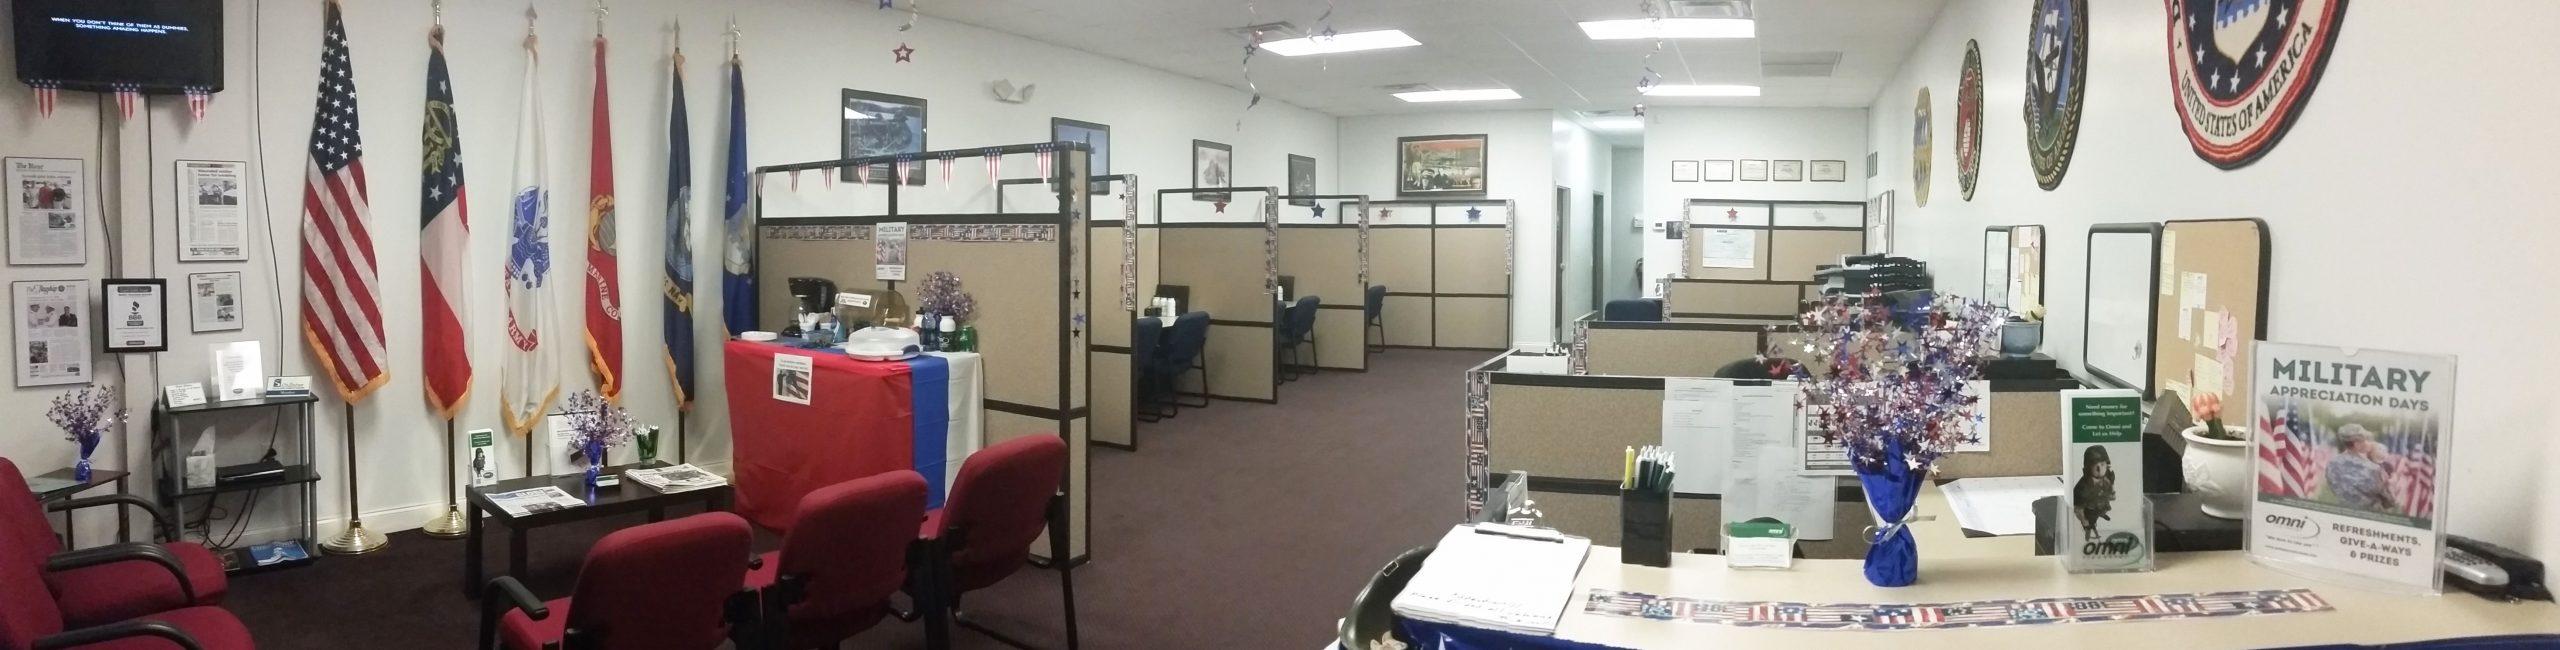 Office Interior Panorama edit